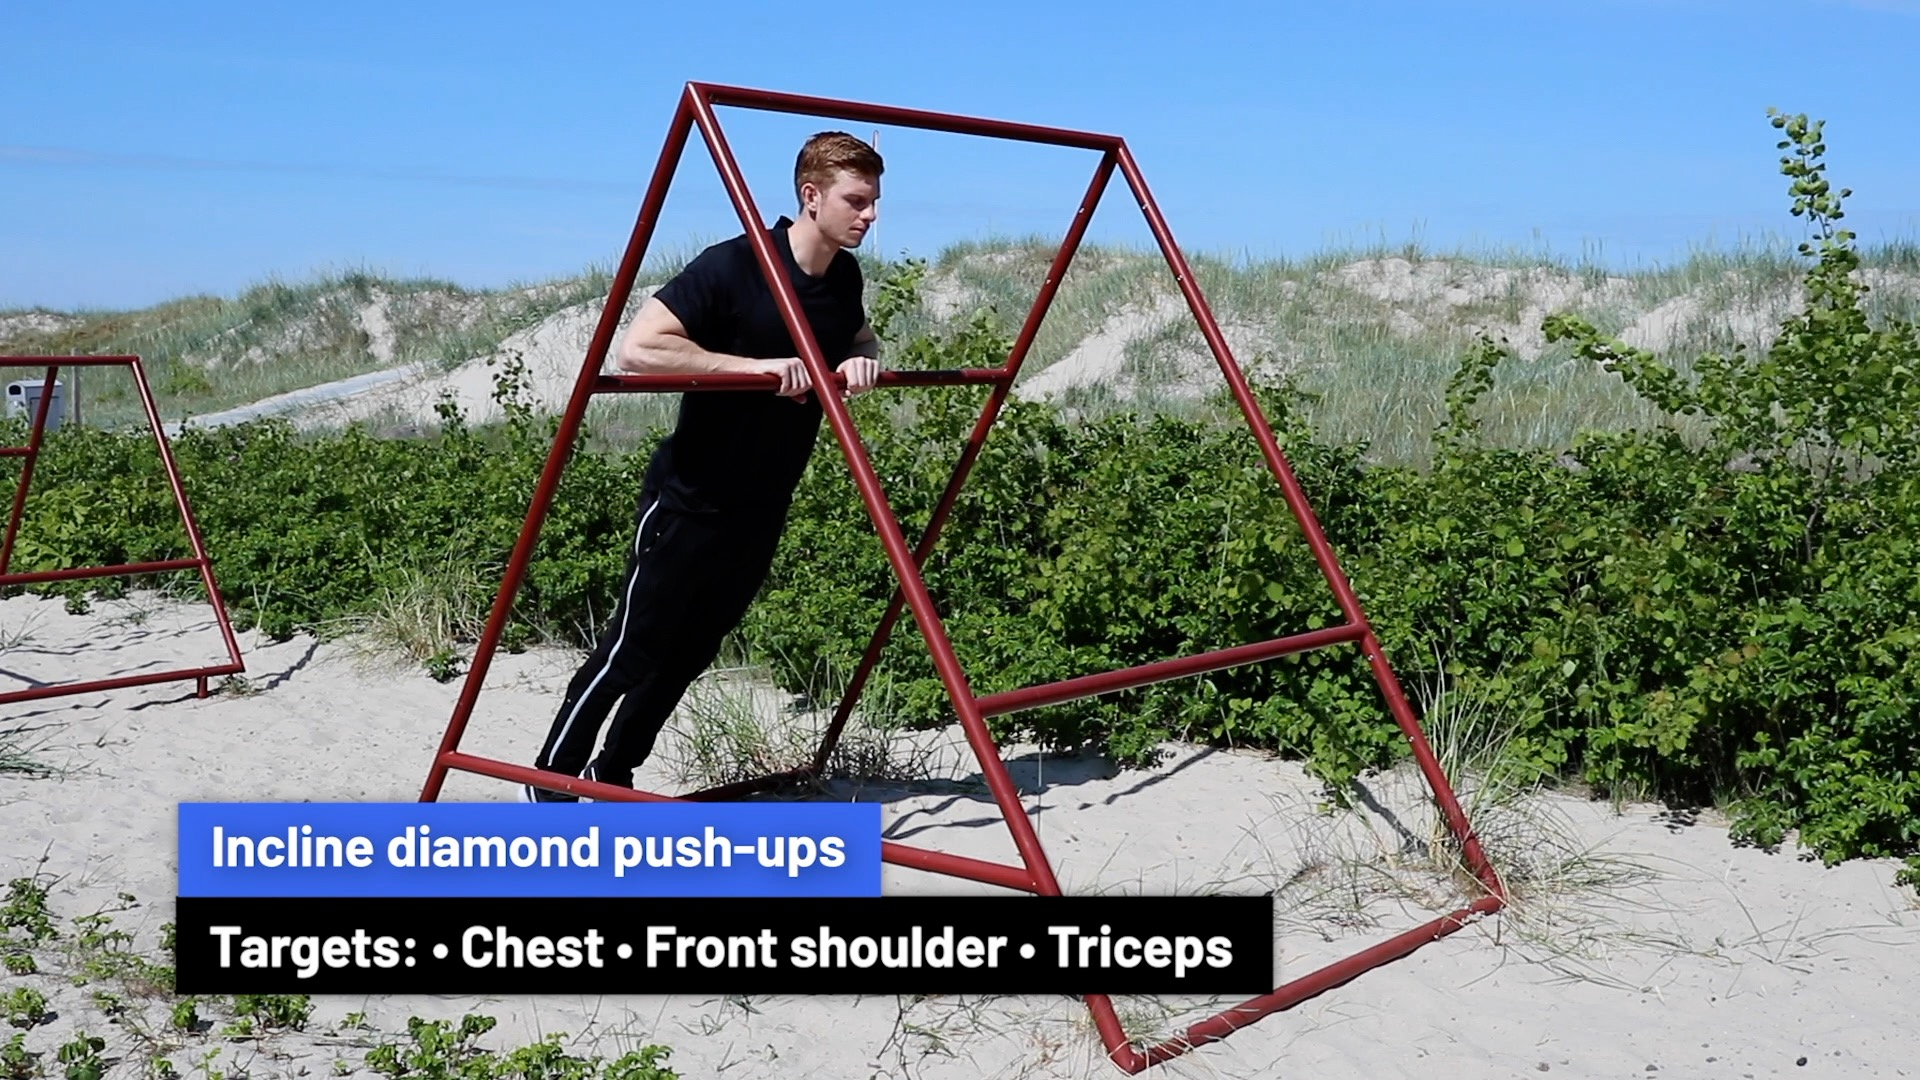 Incline diamond push-ups